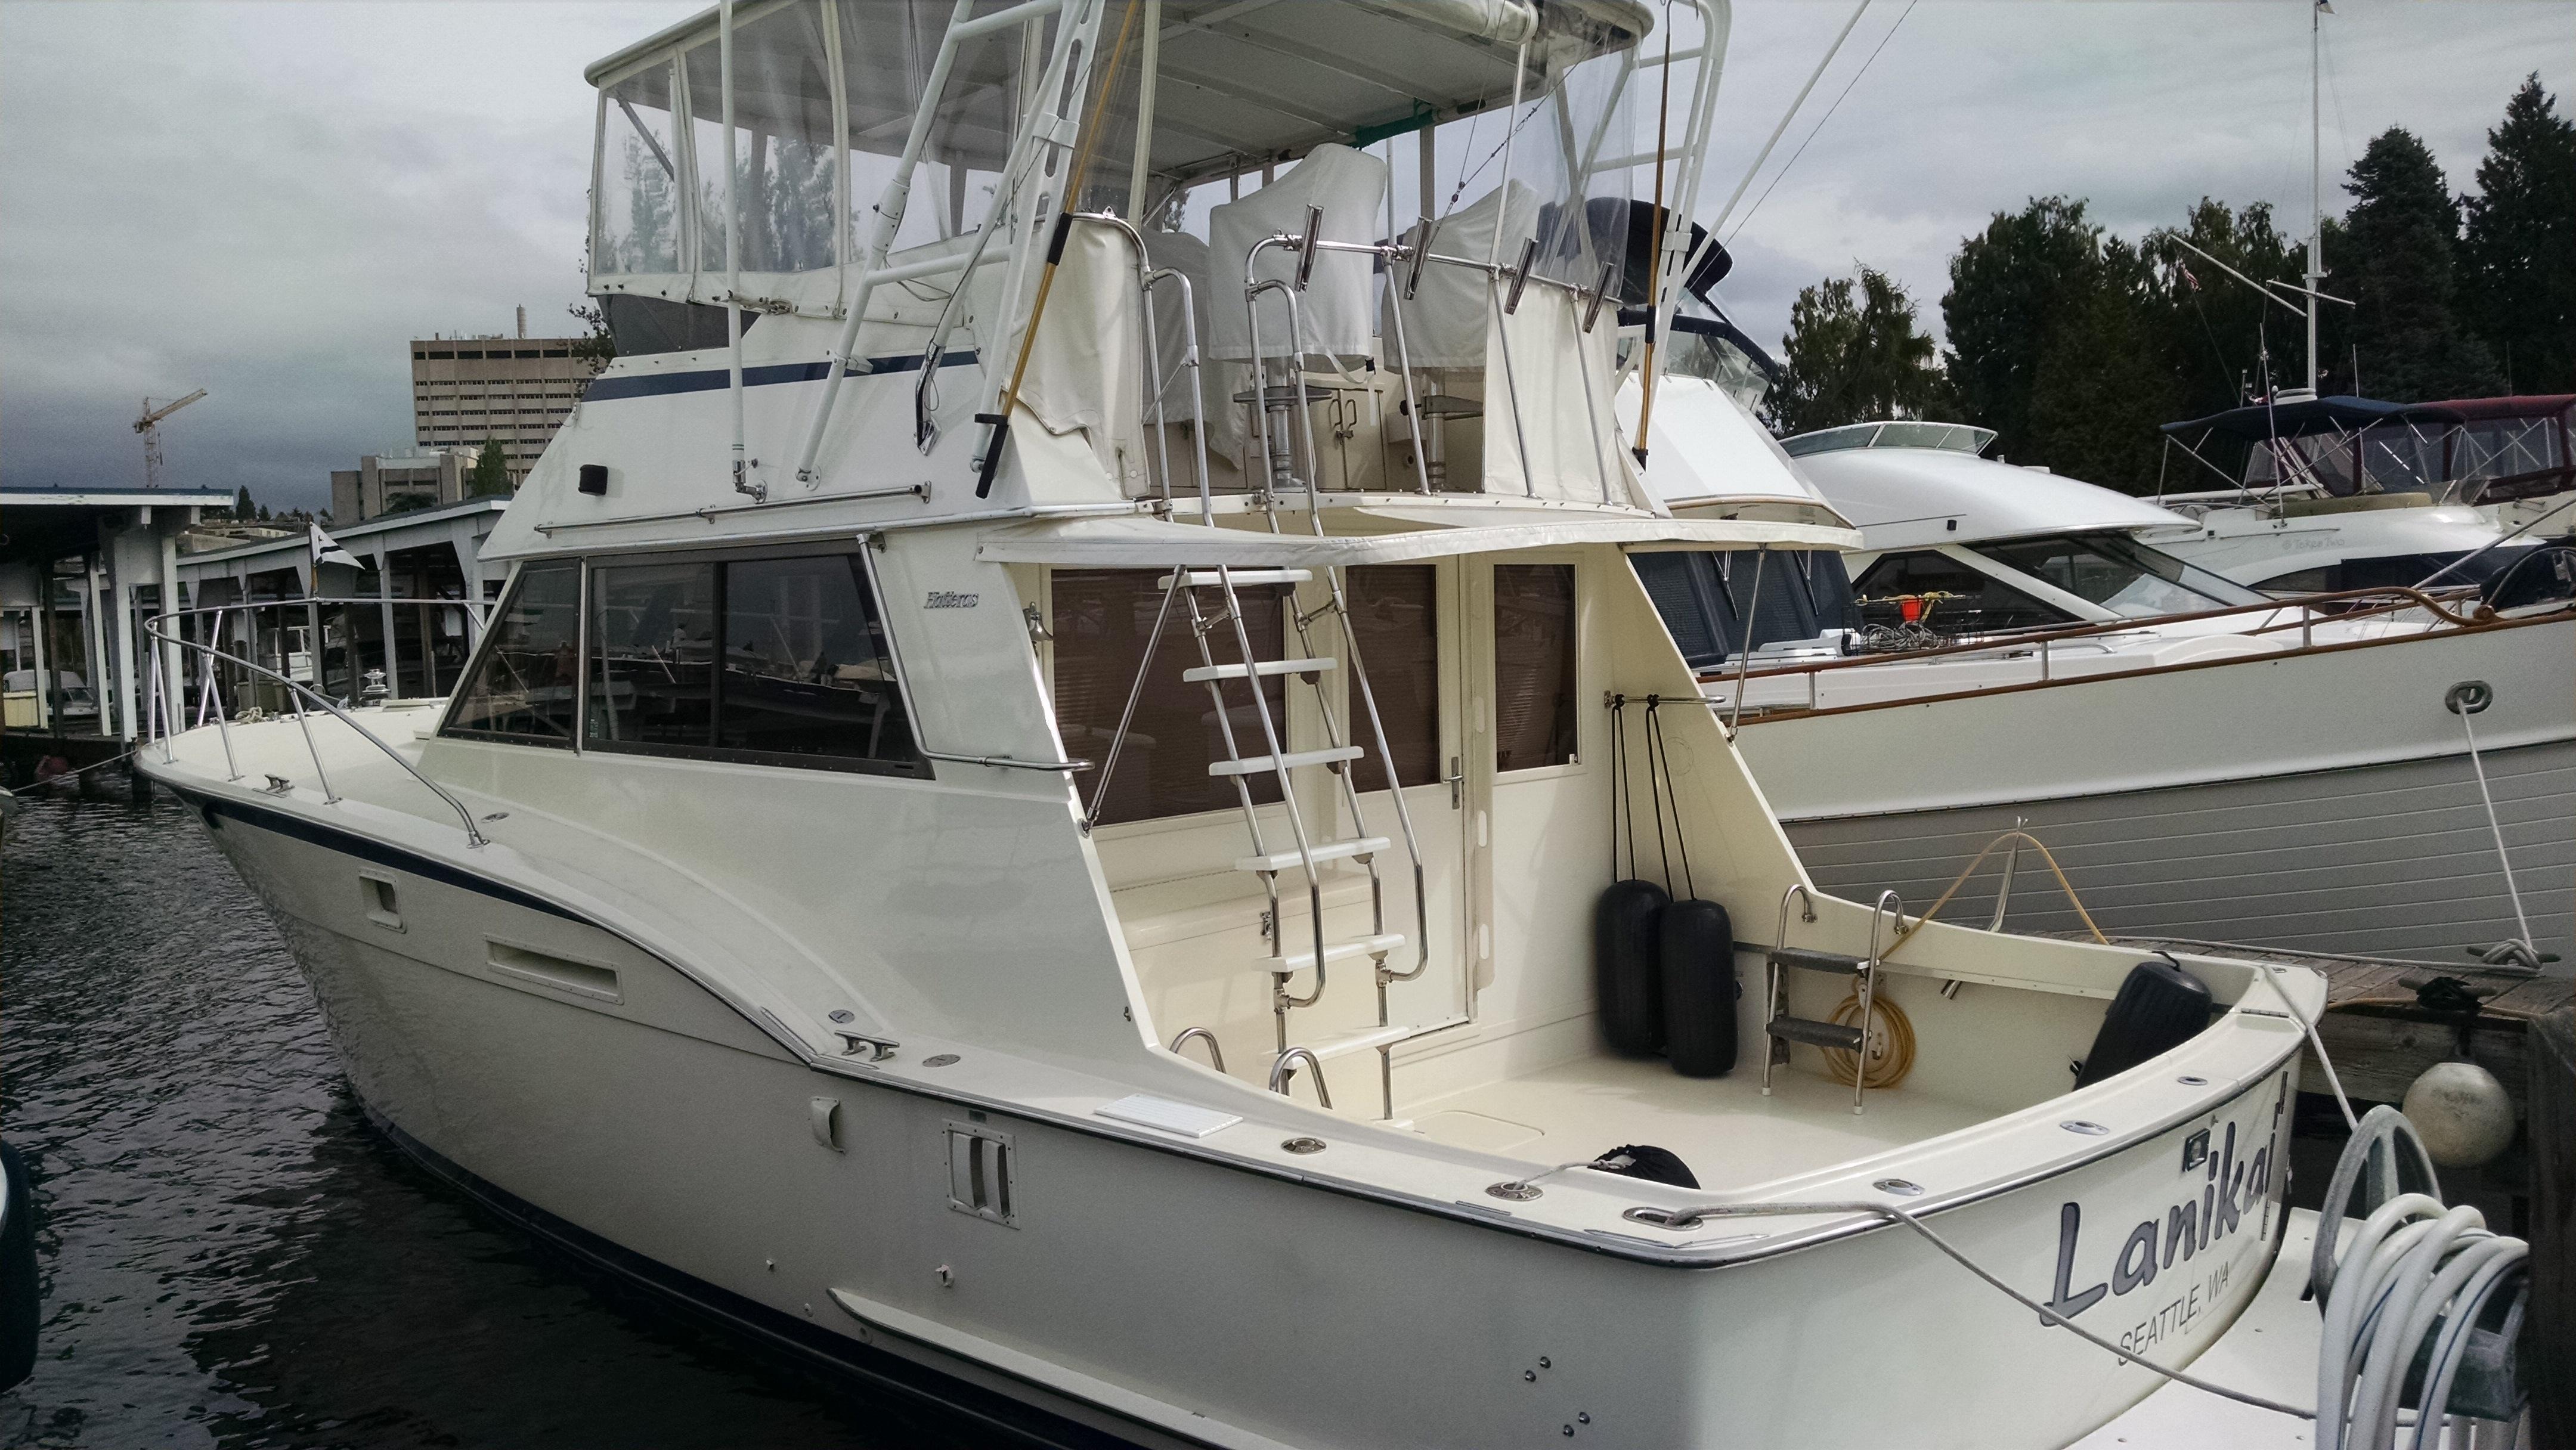 1978 Hatteras Sportfisher Power Boat For Sale - www.yachtworld.com